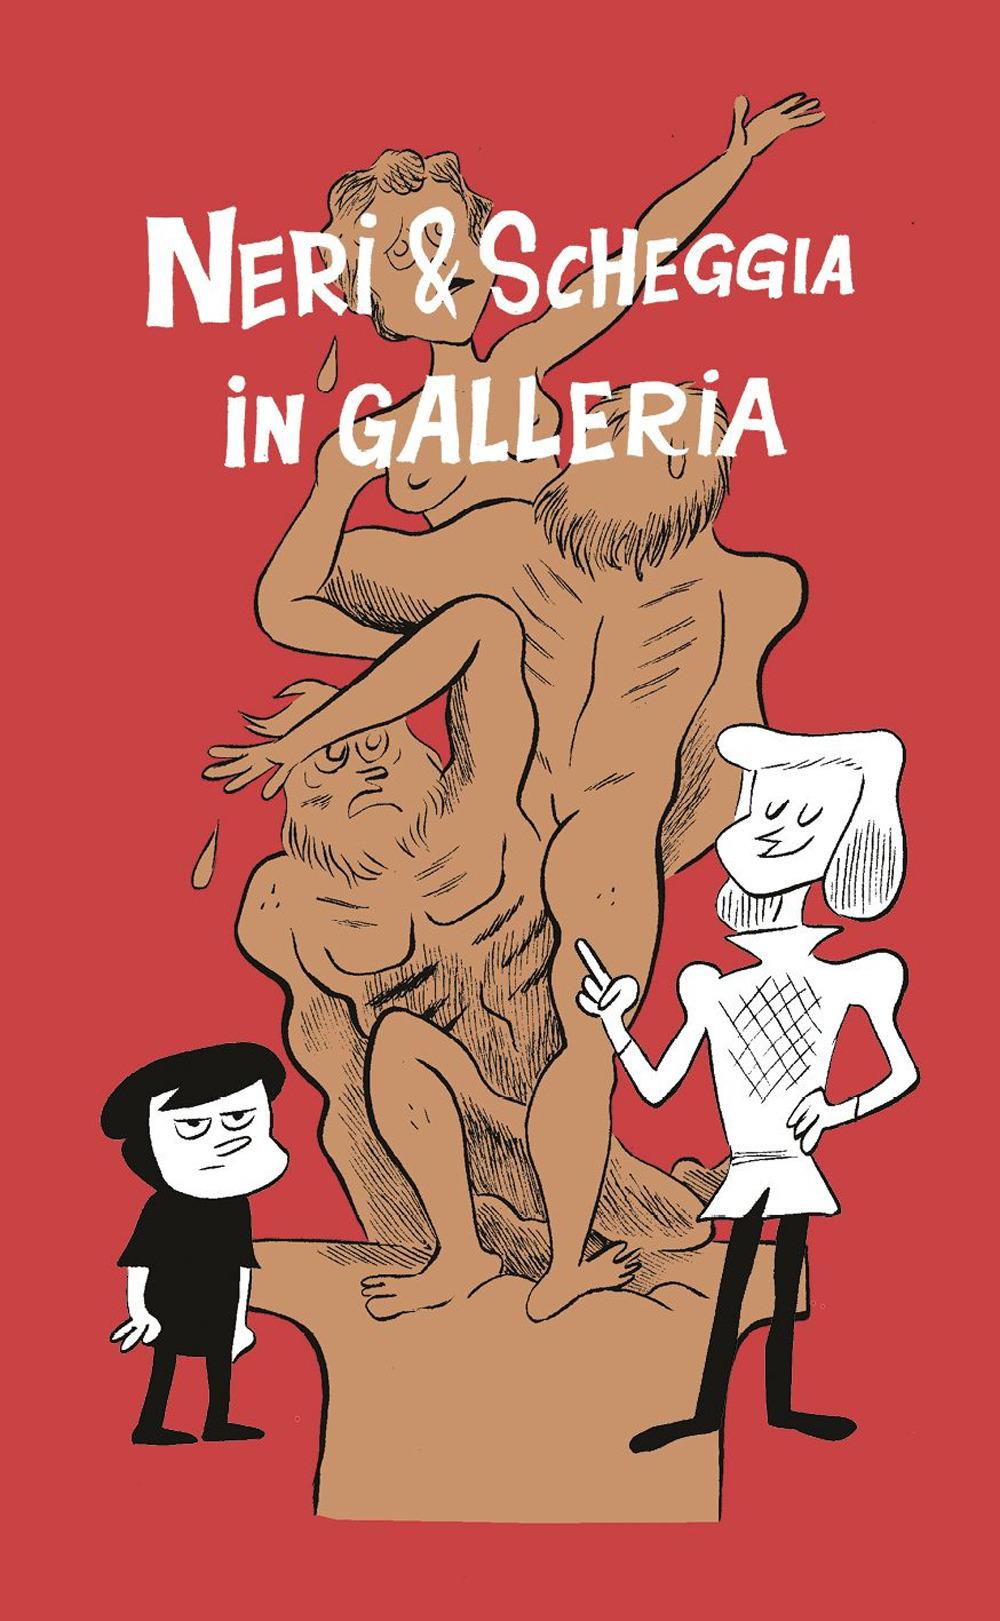 NERI & SCHEGGIA IN GALLERIA vol.2